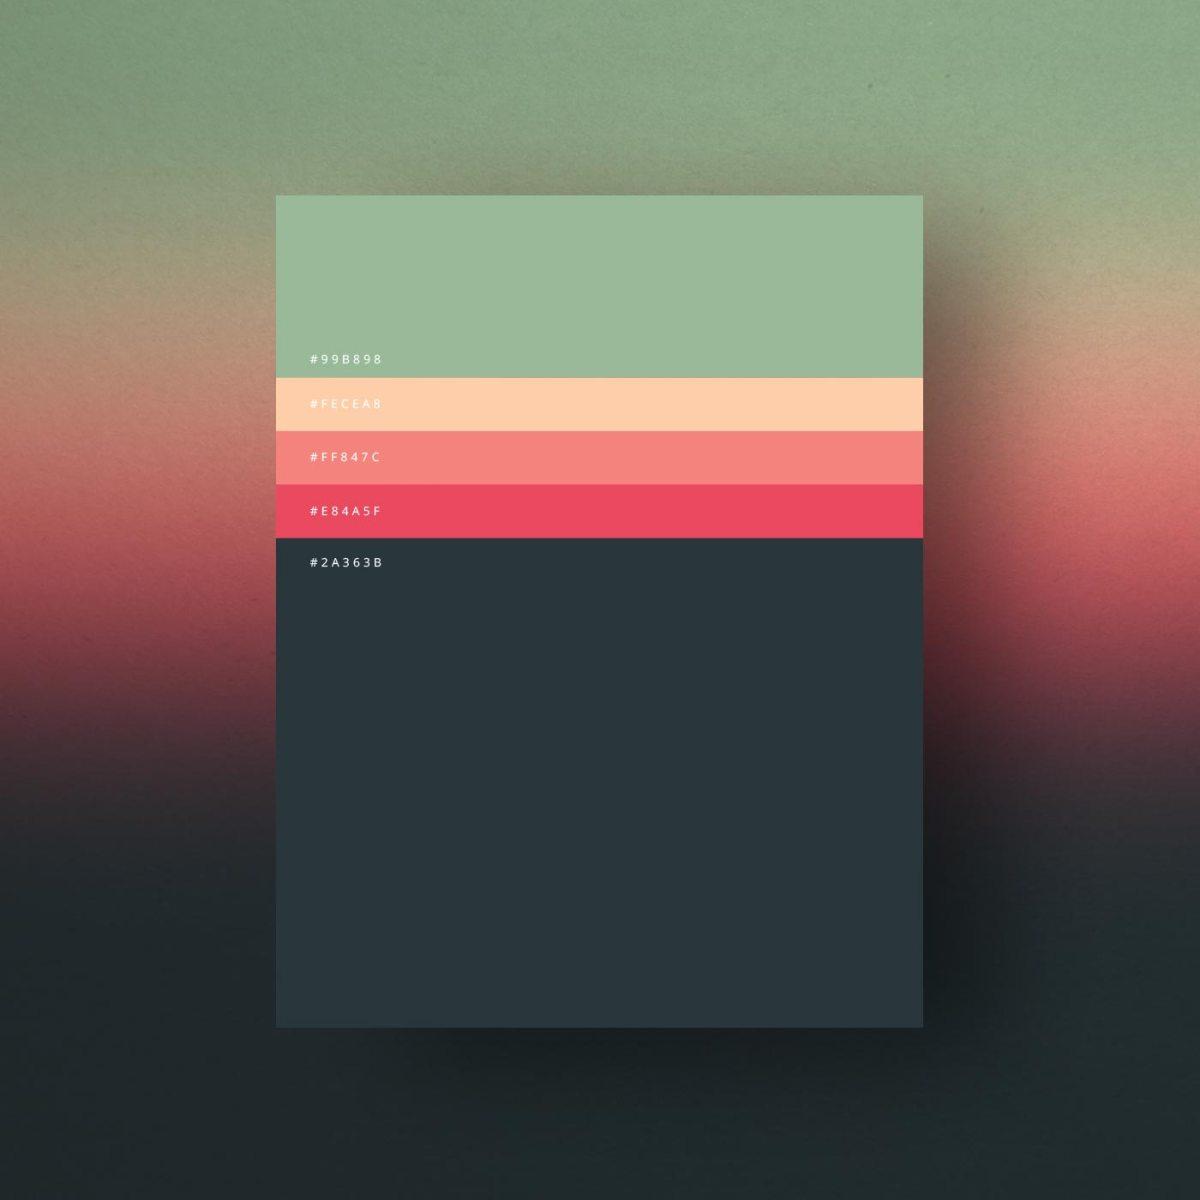 minimalist-color-palettes-of-2015-4